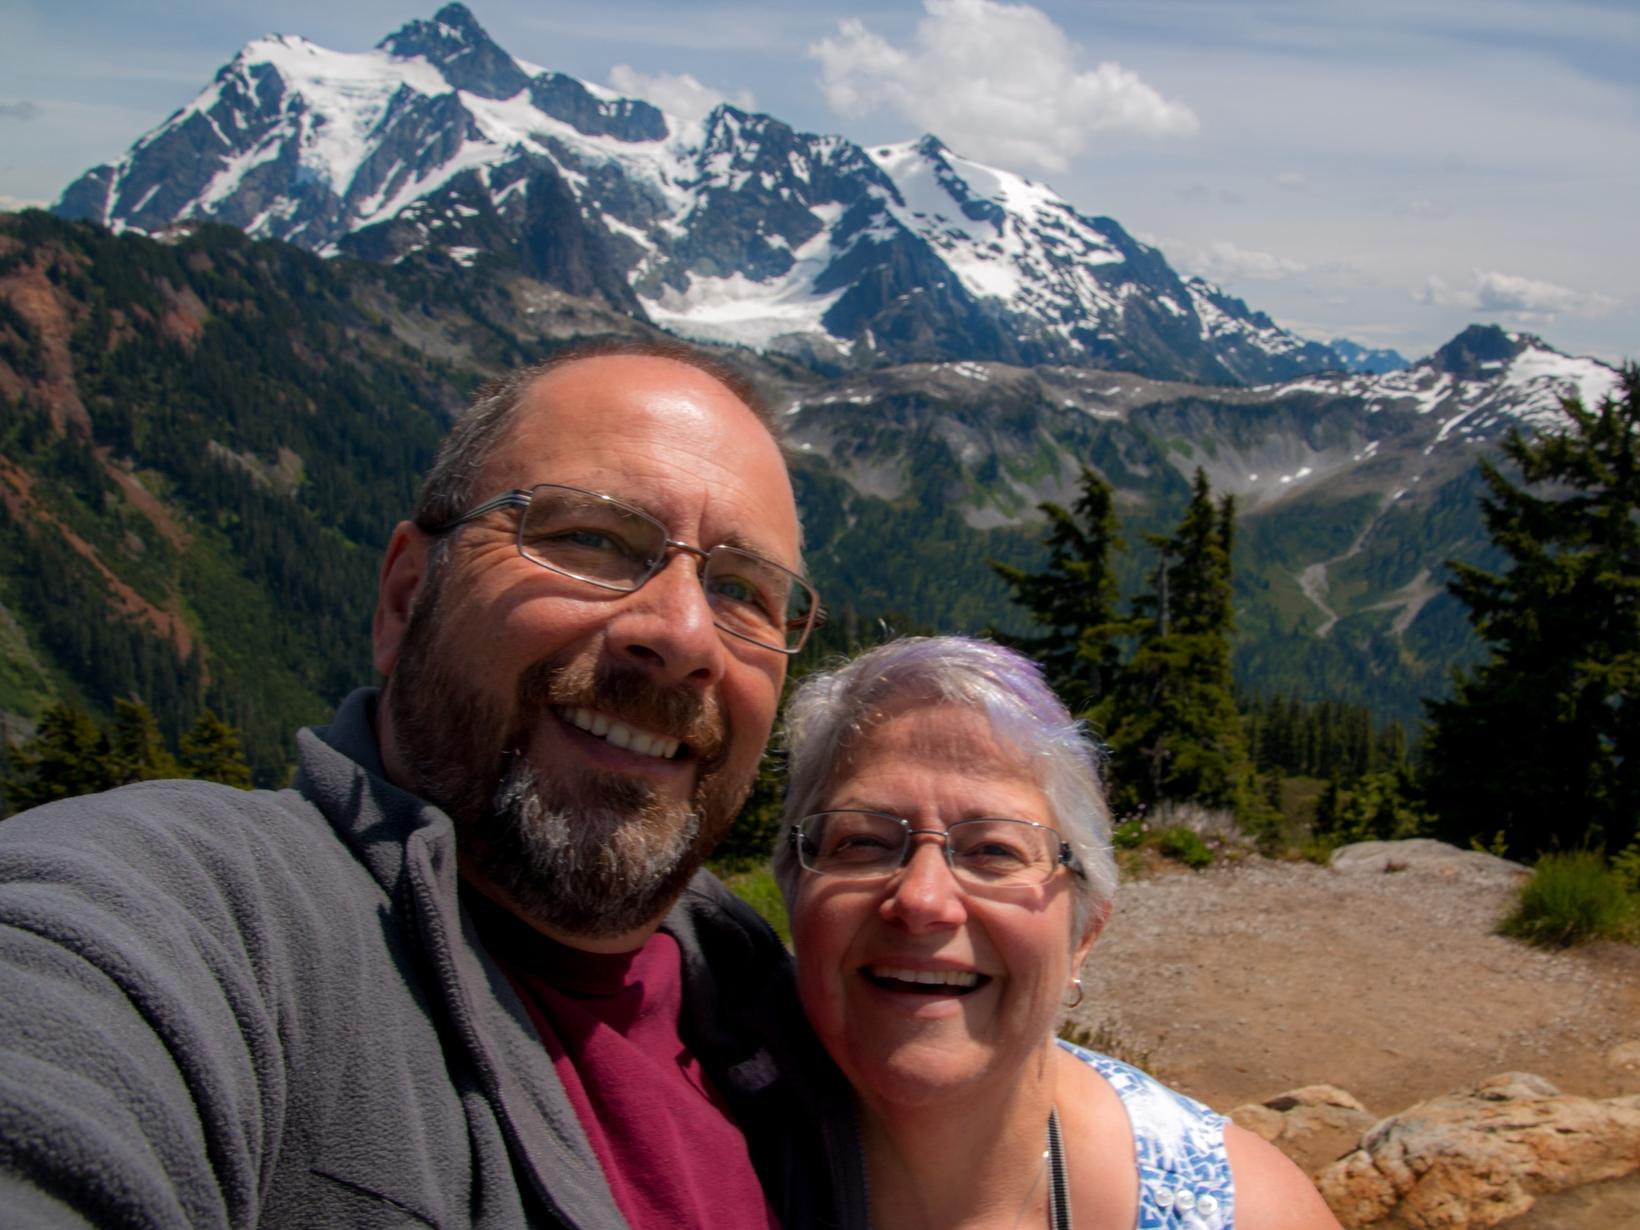 George & Jill from Courtenay, British Columbia, Canada